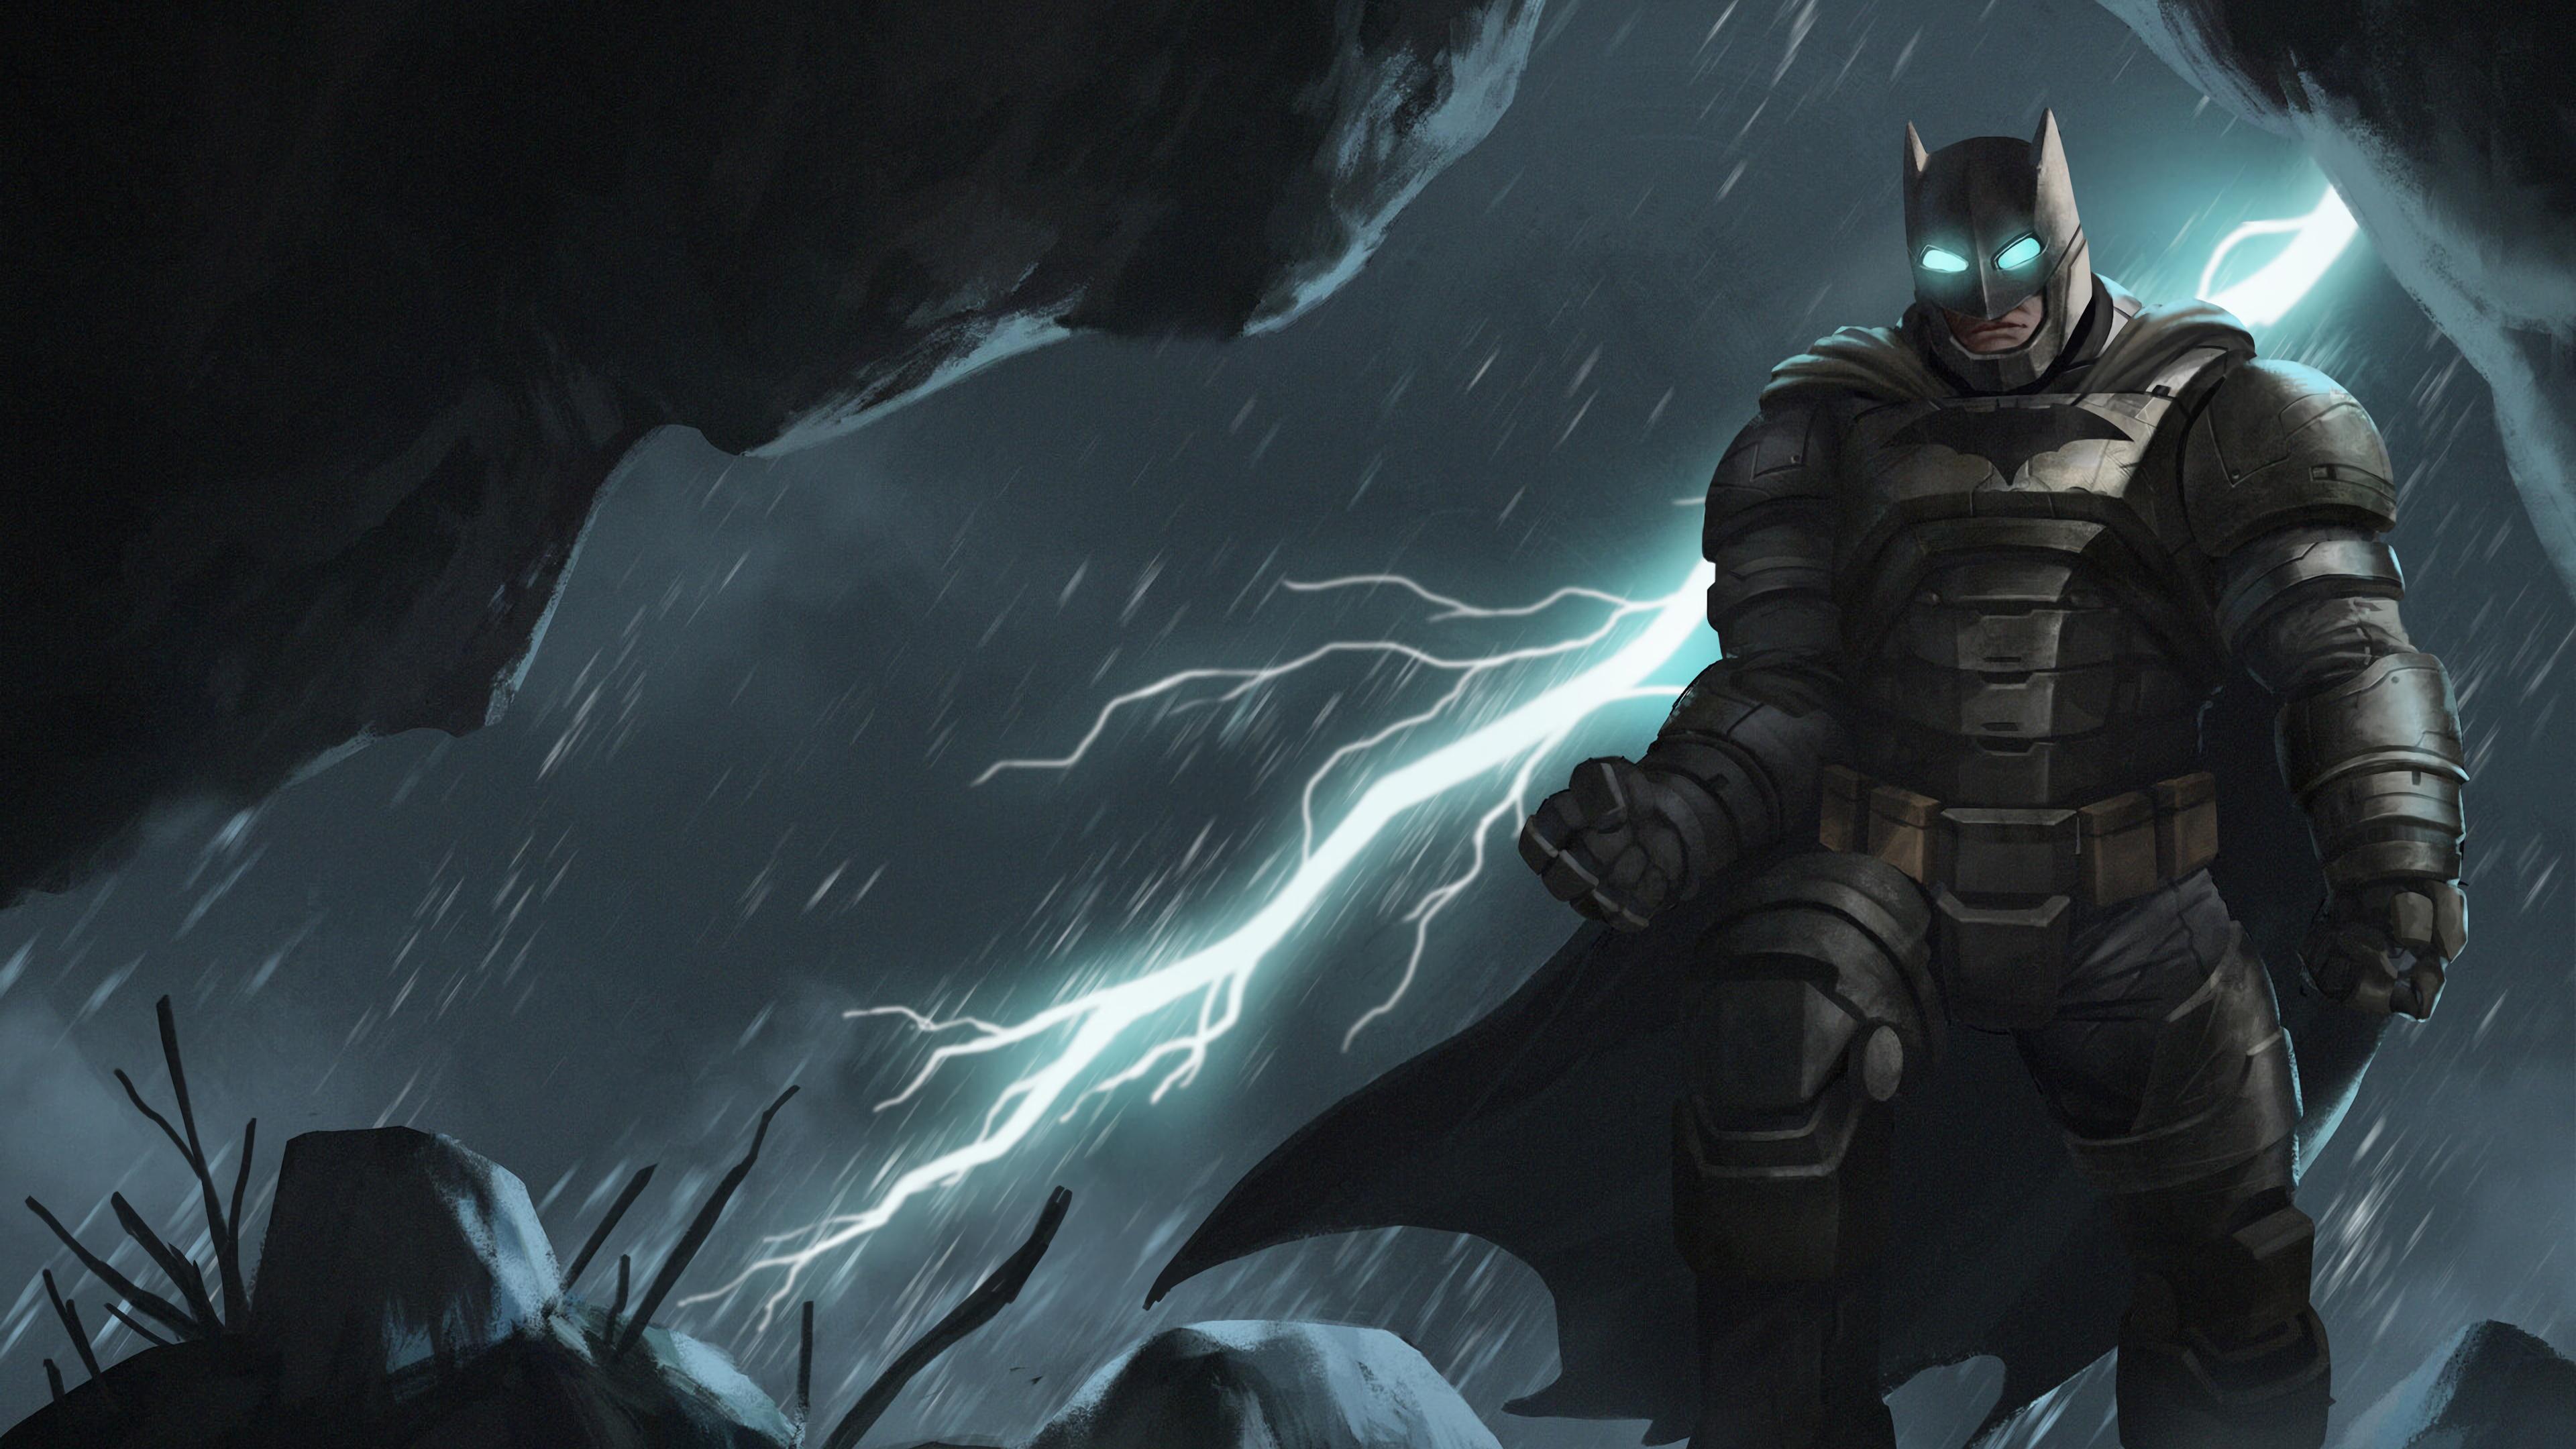 batman armour 1568054832 - Batman Armour - superheroes wallpapers, hd-wallpapers, digital art wallpapers, behance wallpapers, batman wallpapers, artwork wallpapers, 4k-wallpapers